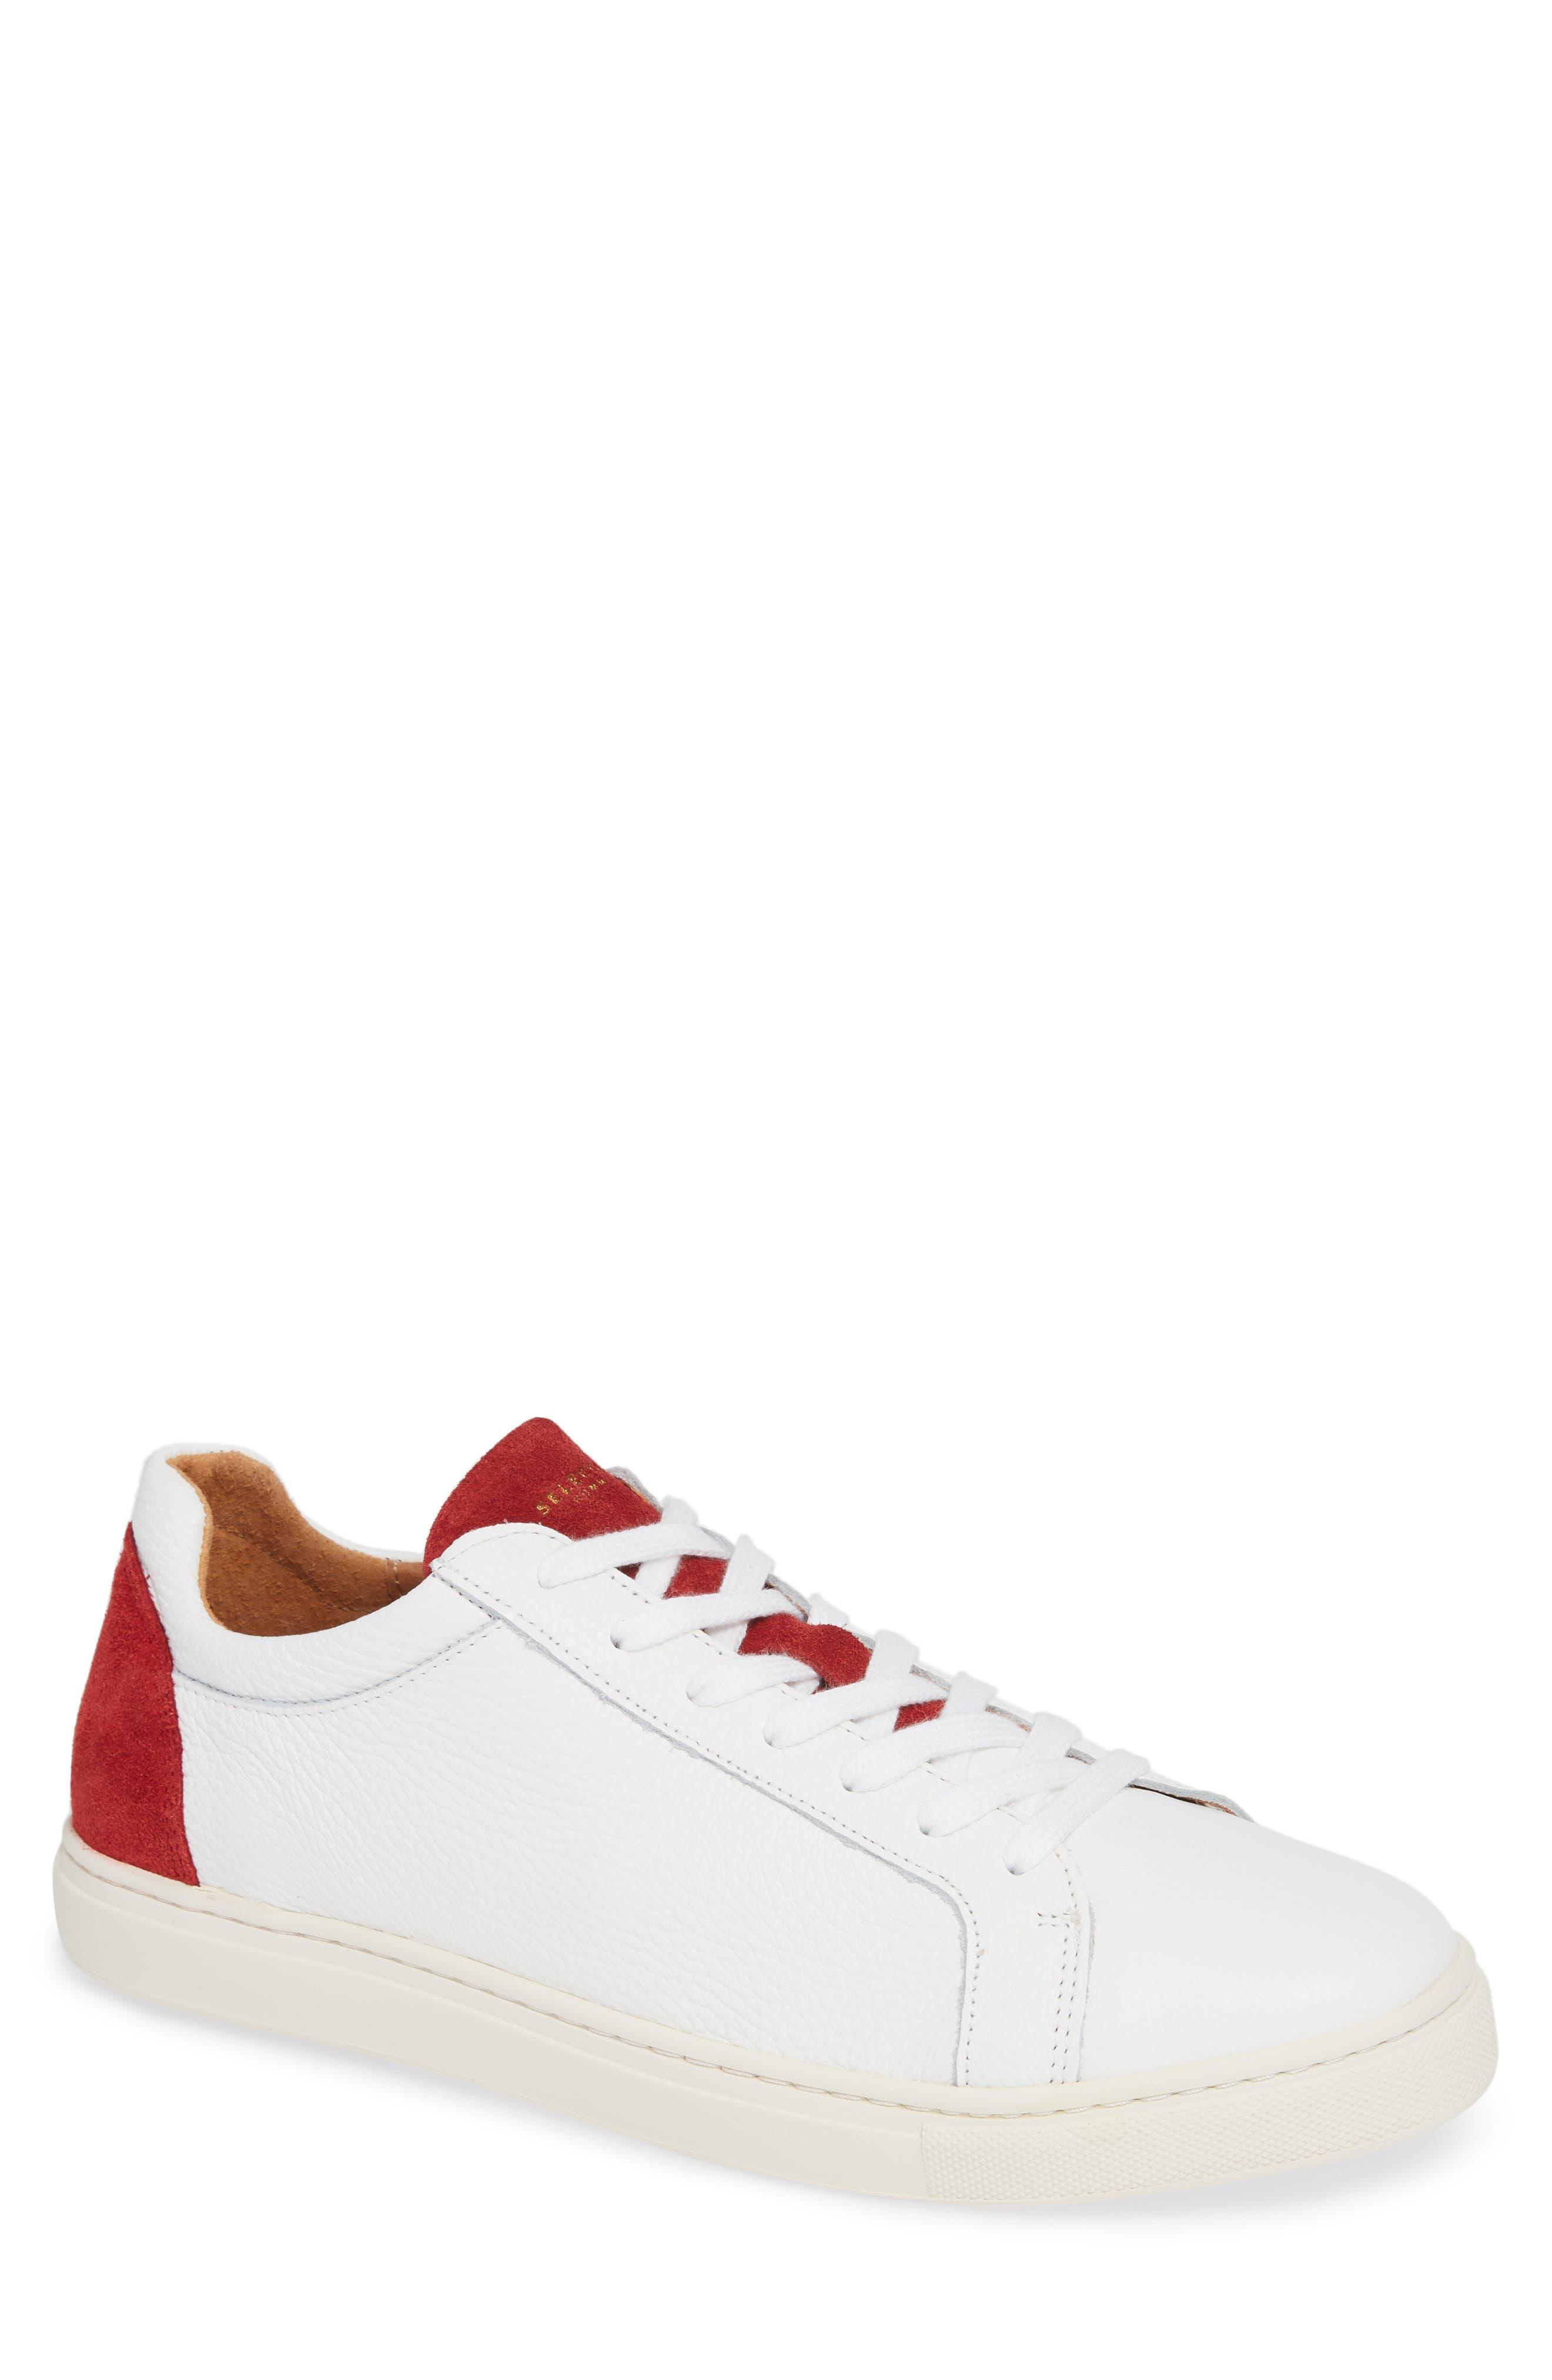 David Colorblock Sneaker,                             Main thumbnail 1, color,                             WHITE/ BARBADOS CHERRY